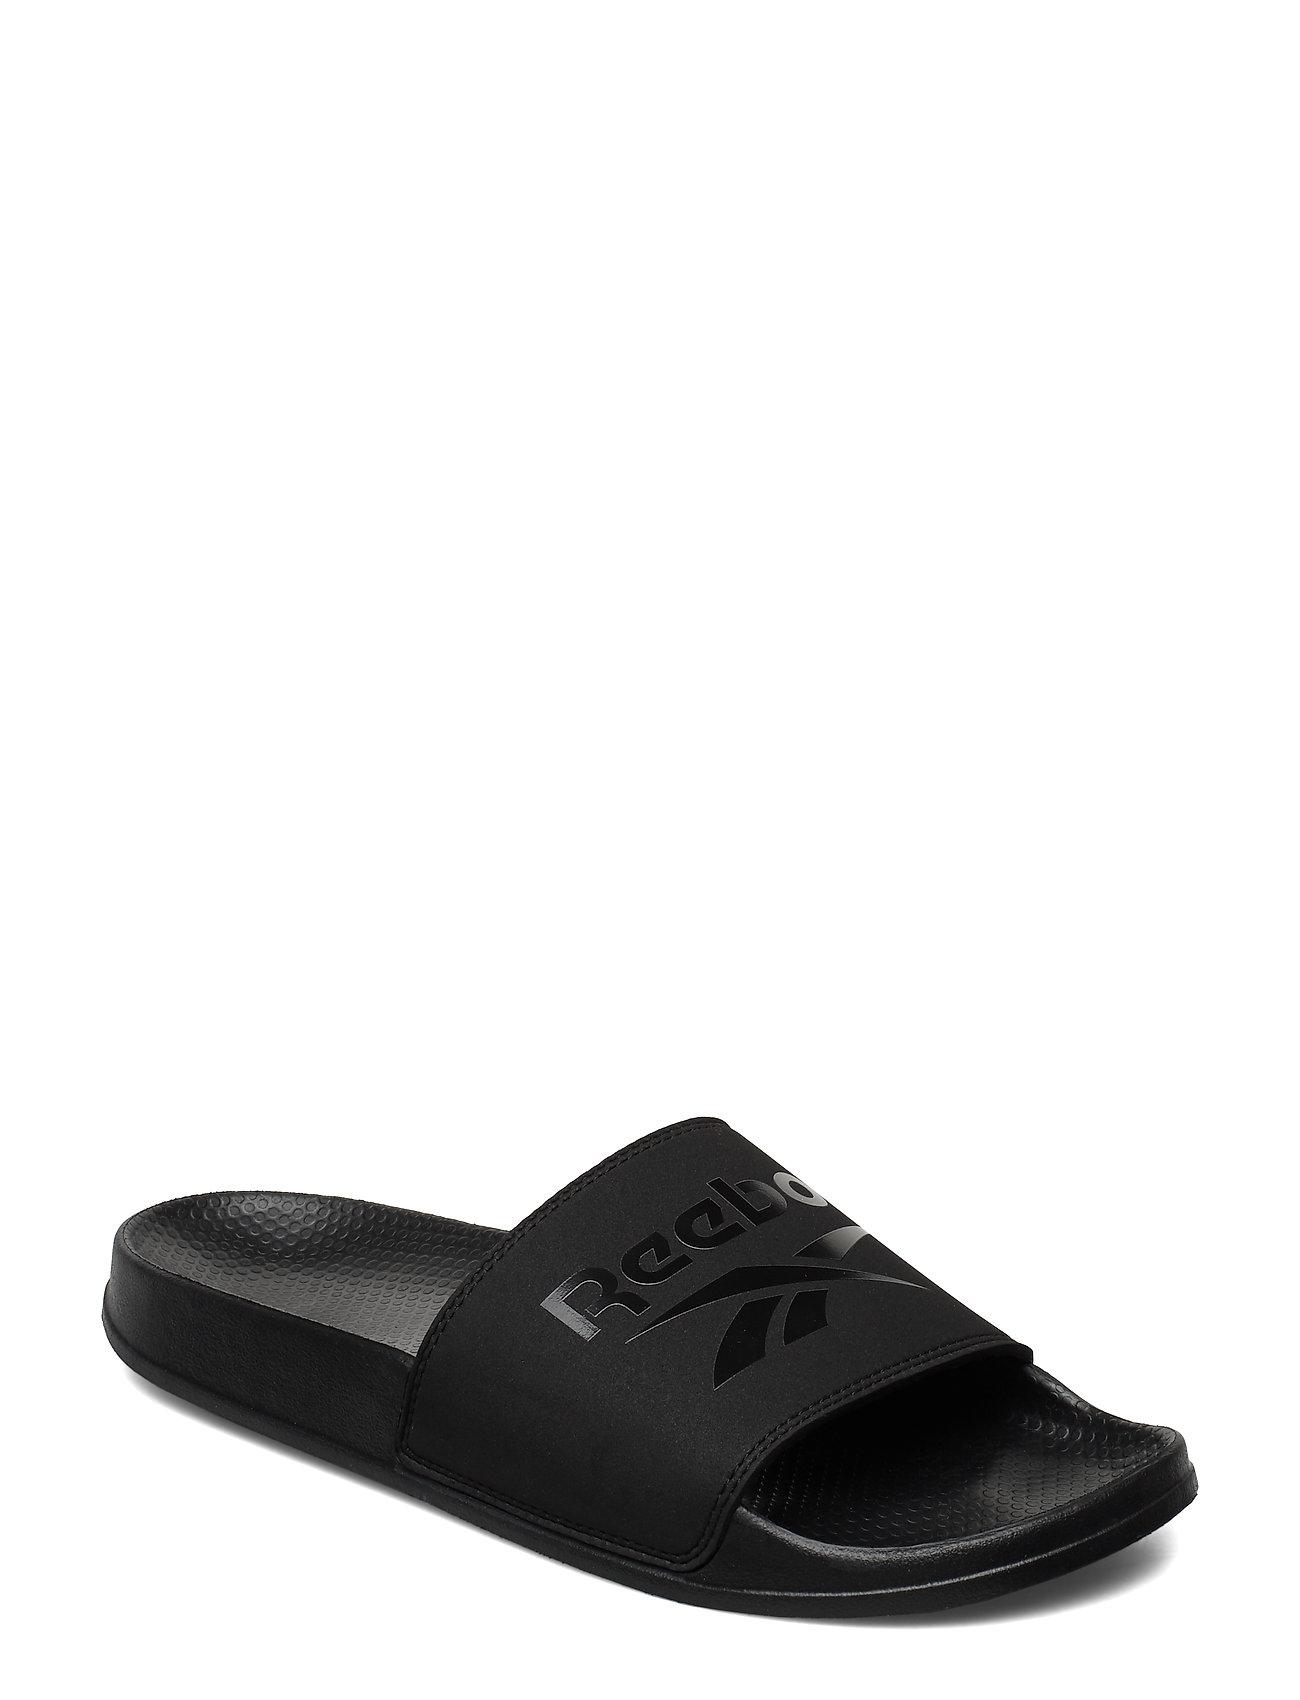 Reebok Performance Reebok Fulgere Slides - BLACK